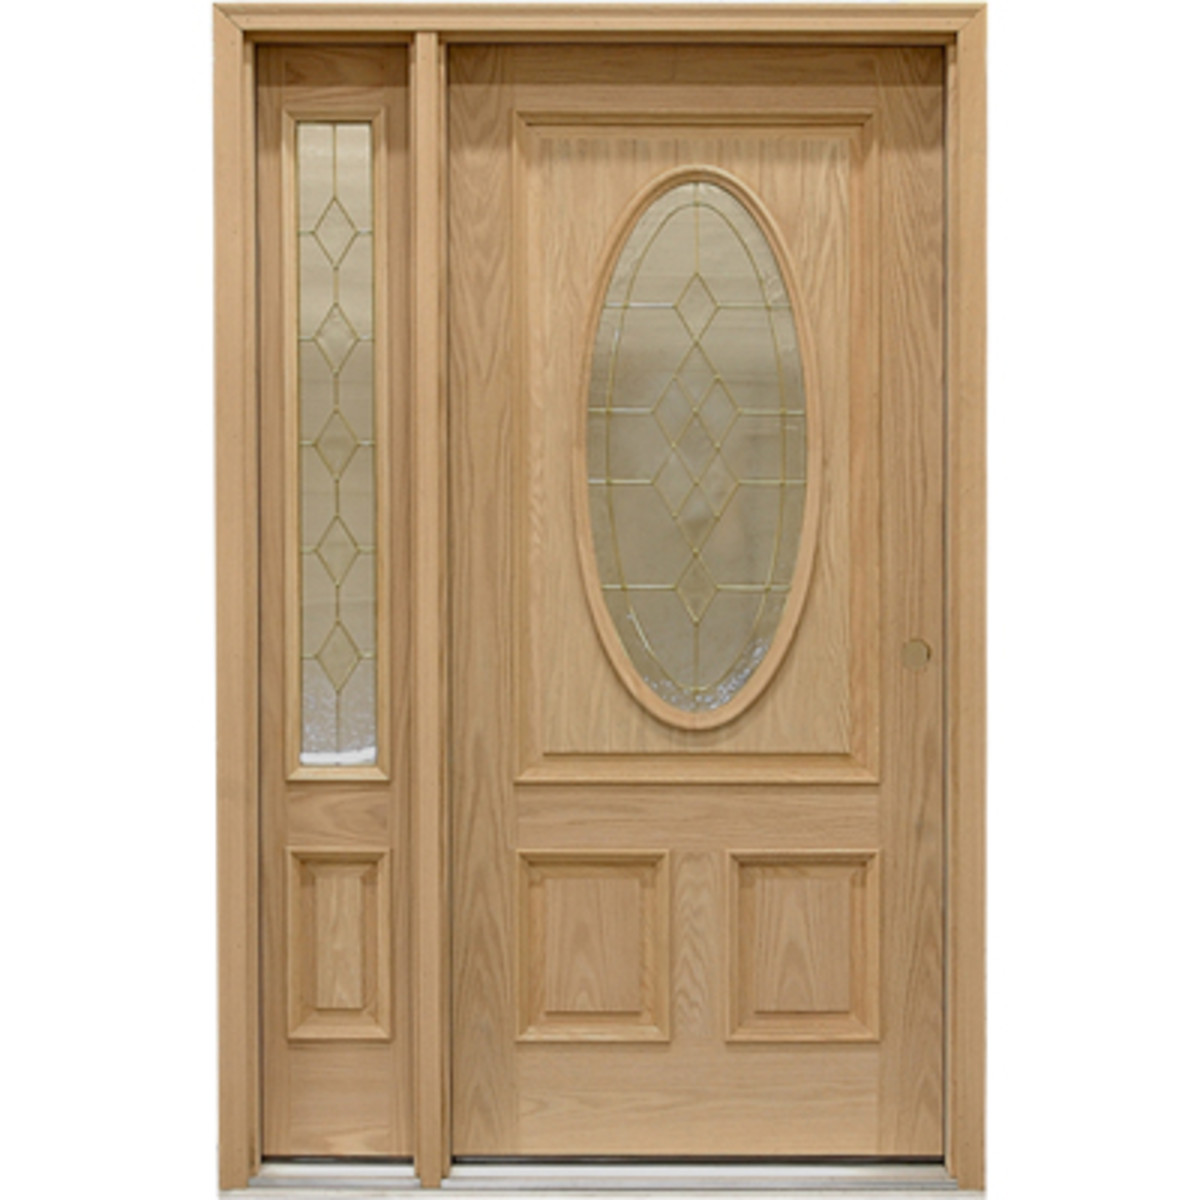 Oak door with one sidelight by bargainoutlet.com